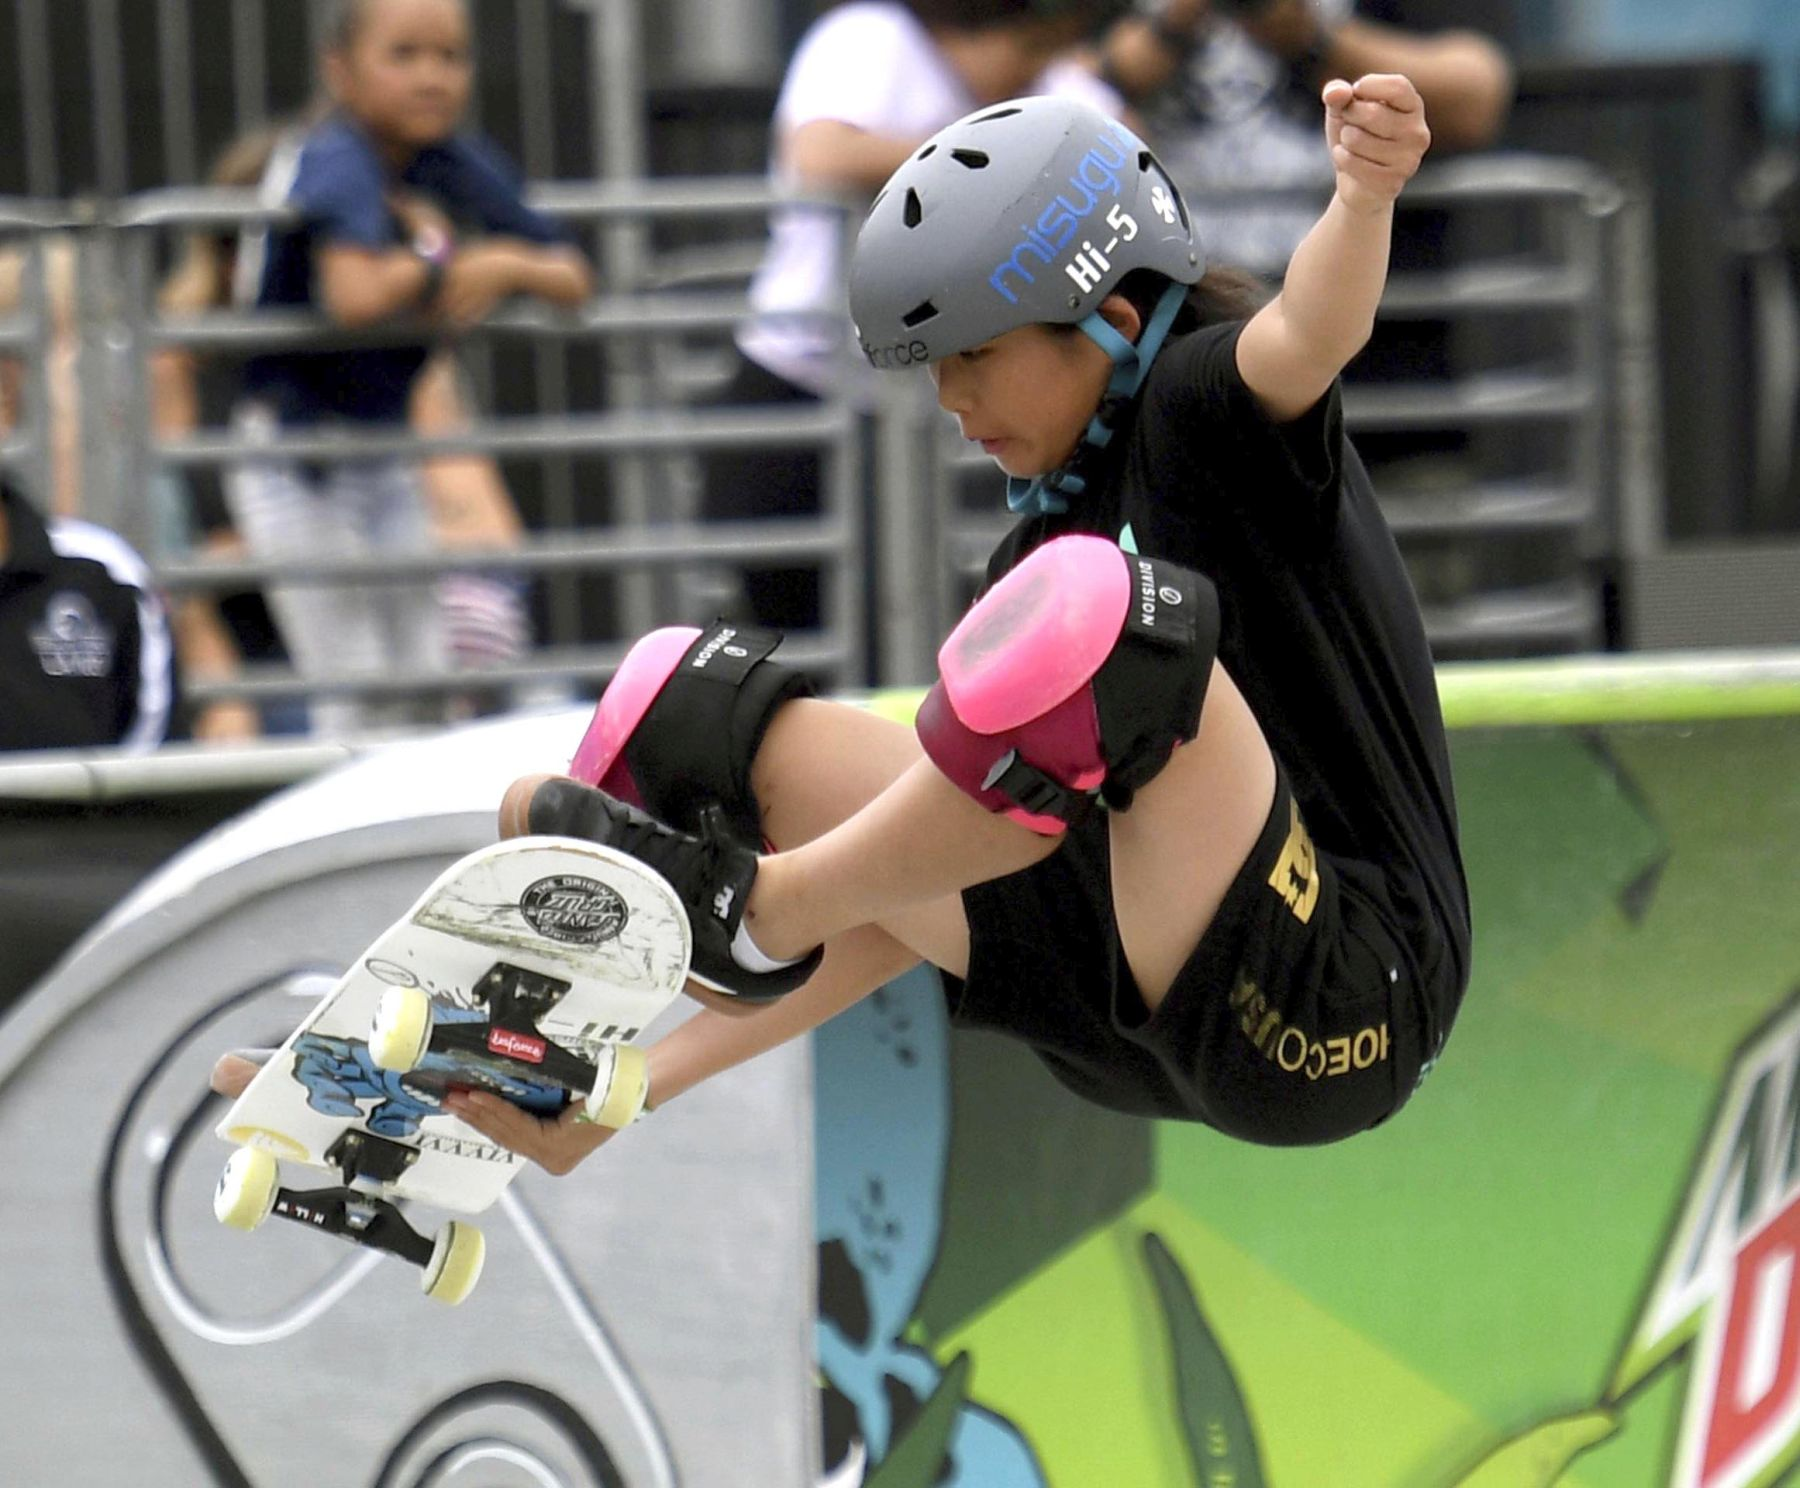 Misugu Okamoto Japan Wins in the Womens Park Skateboard Final 001